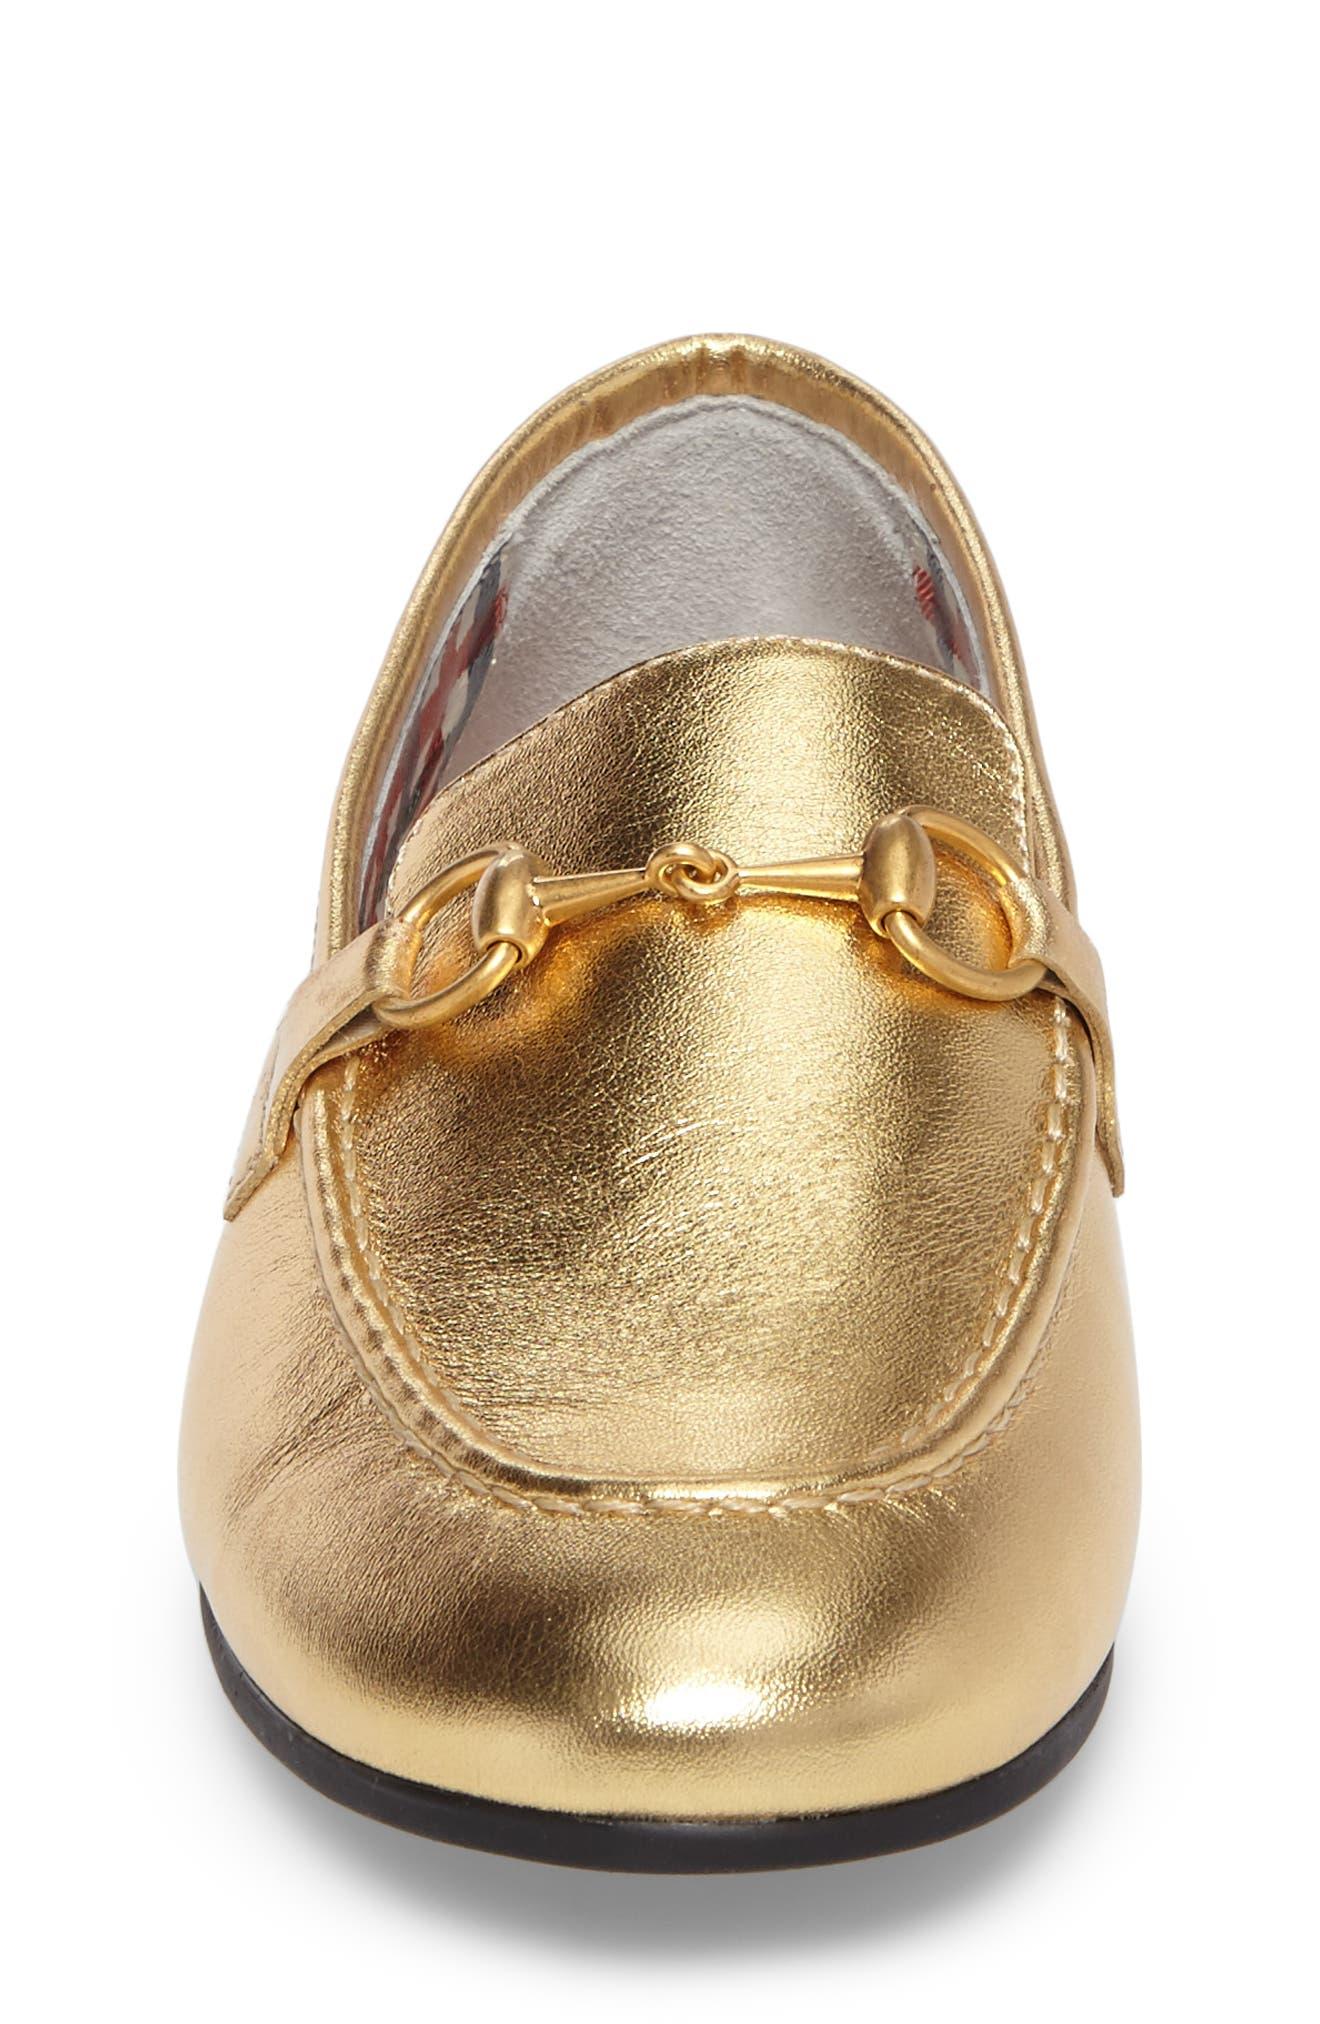 Jordaan Bit Loafer,                             Alternate thumbnail 4, color,                             METALLIC GOLD